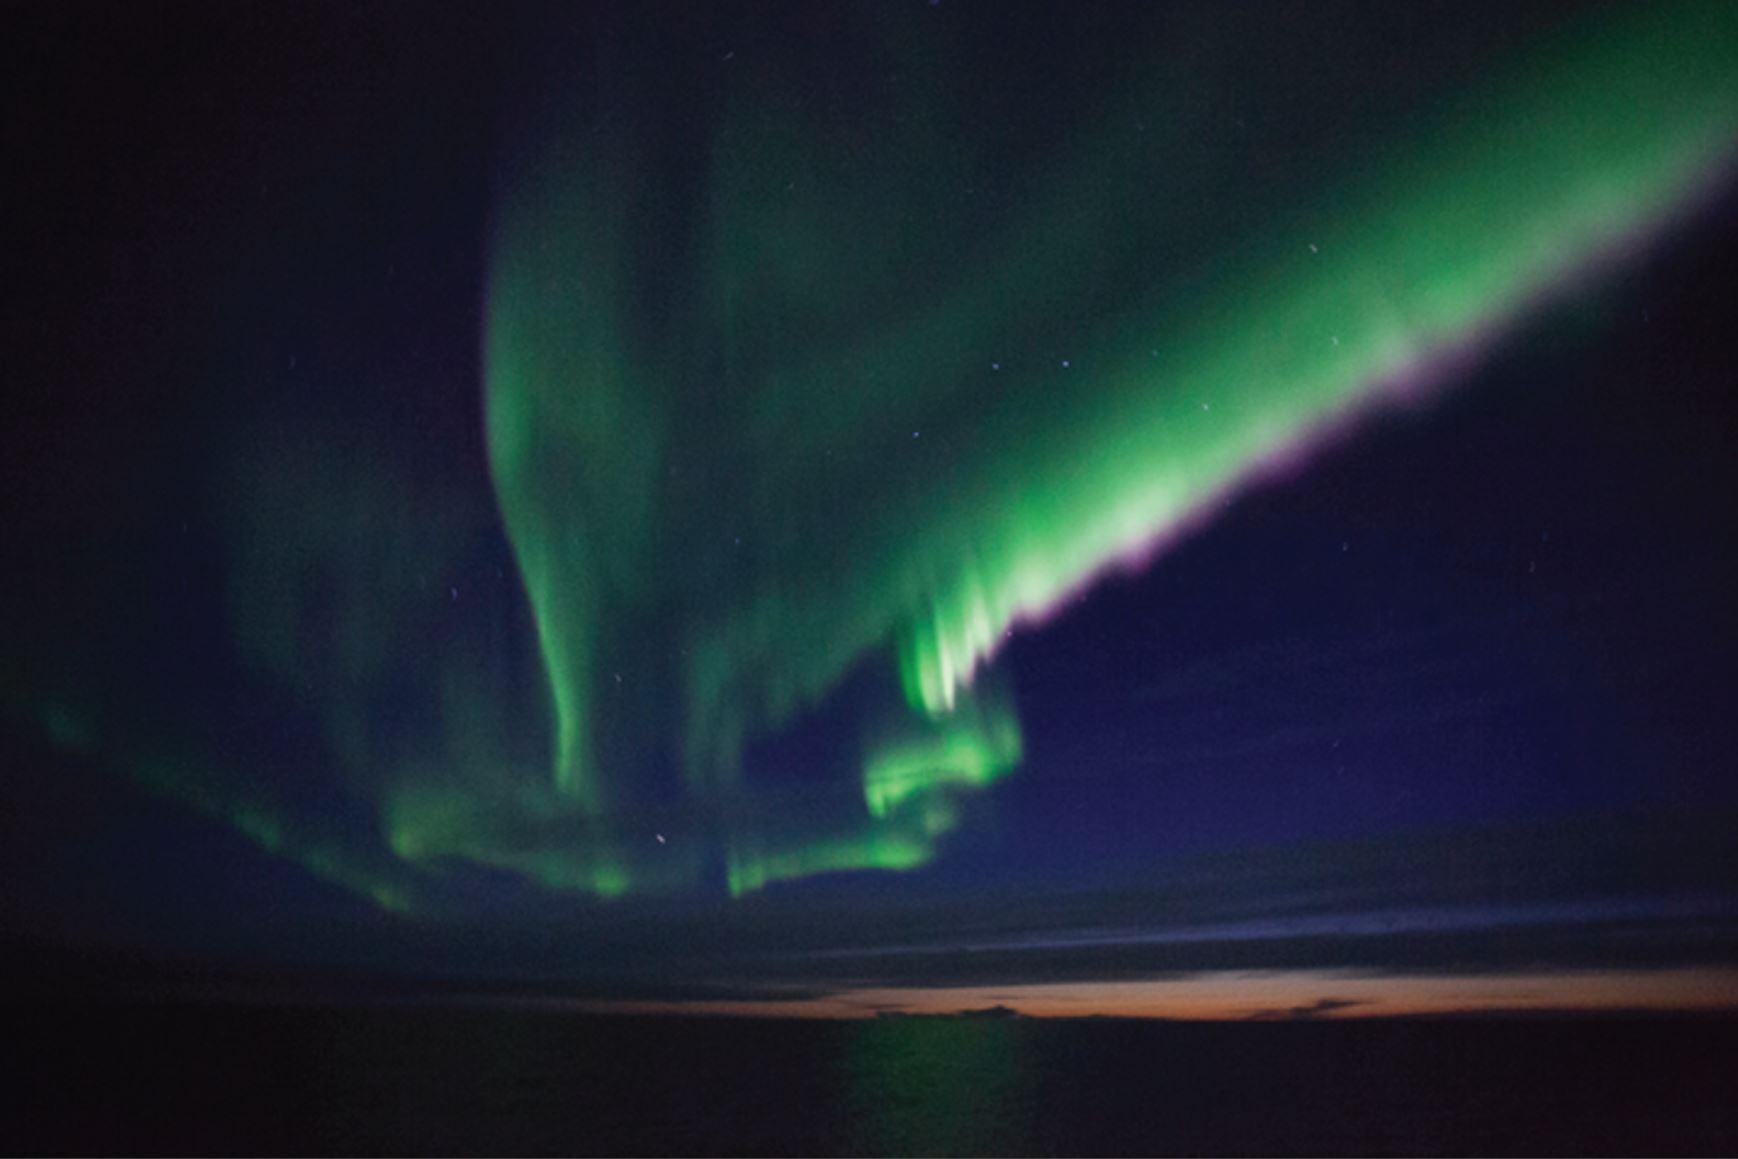 Northern lights above R/V  Ocean Star r night of September 11th.Photo credit: Ryan McCabe